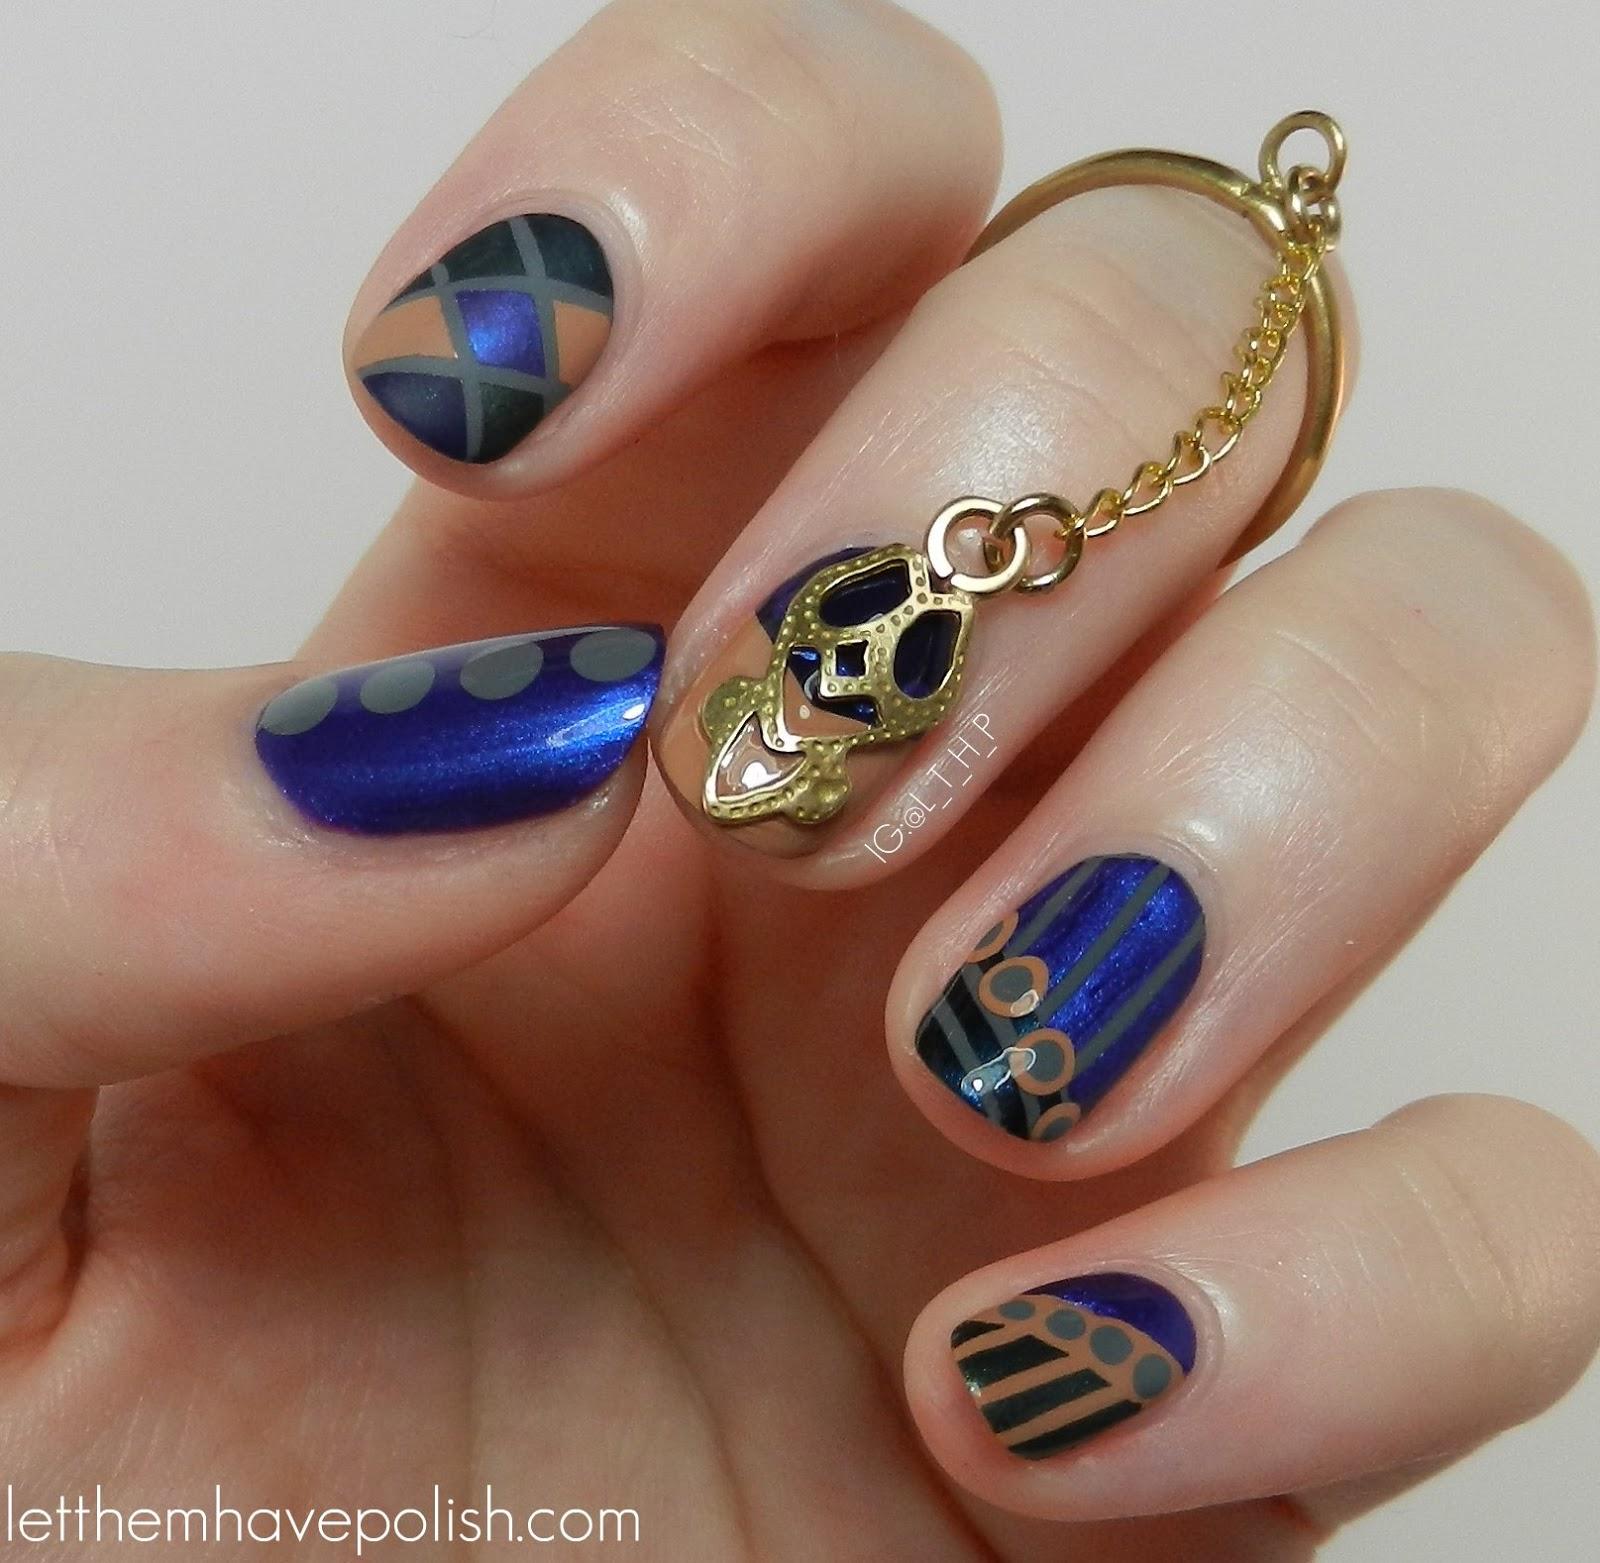 Nail Colour For Autumn 2014. autumn 2014 nail art trends ...